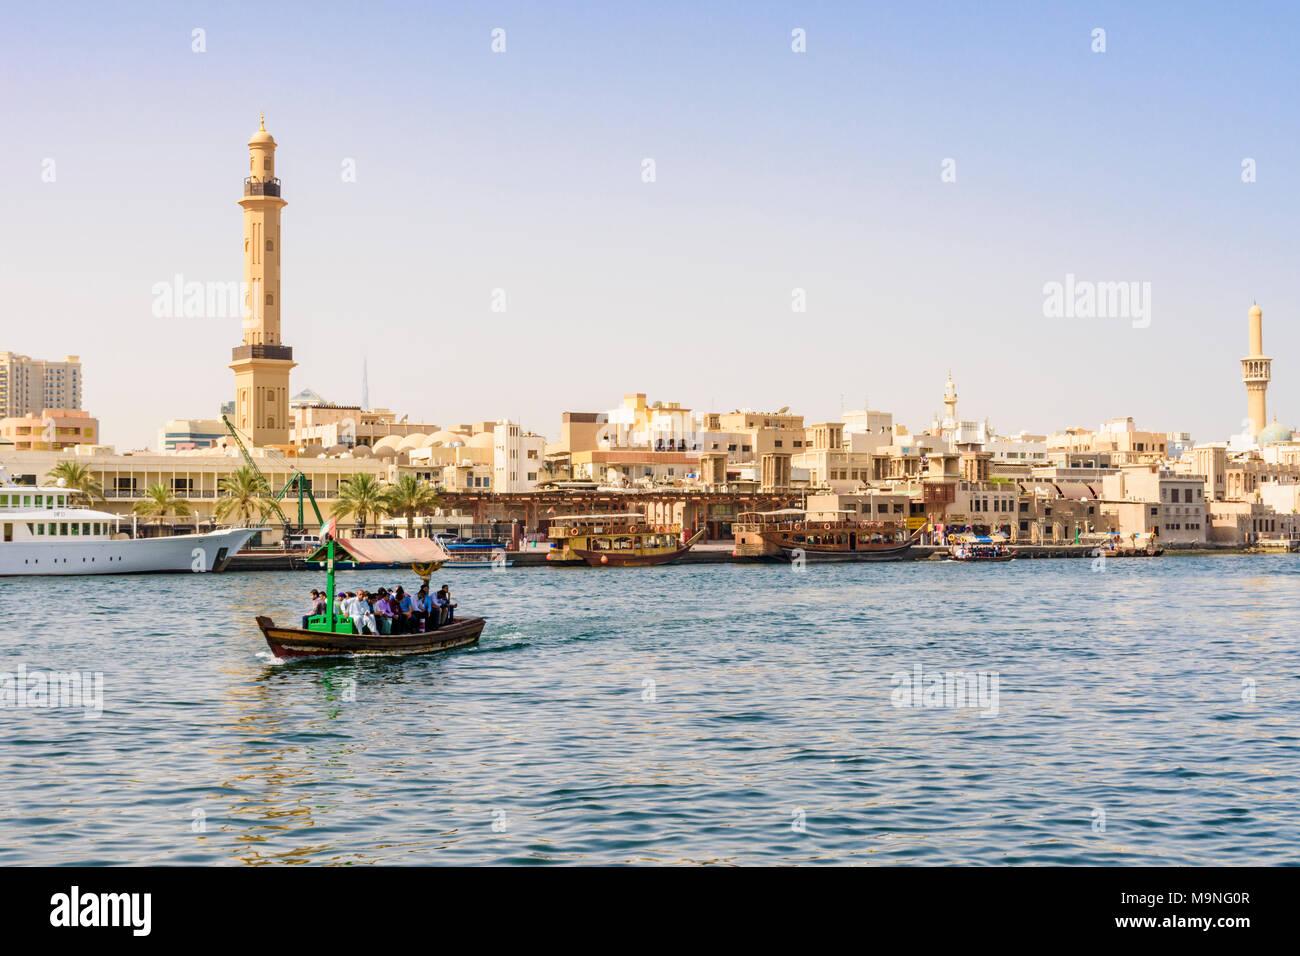 Dubai Creek abra boat with views over to the Grand Mosque Minaret, Dubai Creek, Dubai, UAE - Stock Image